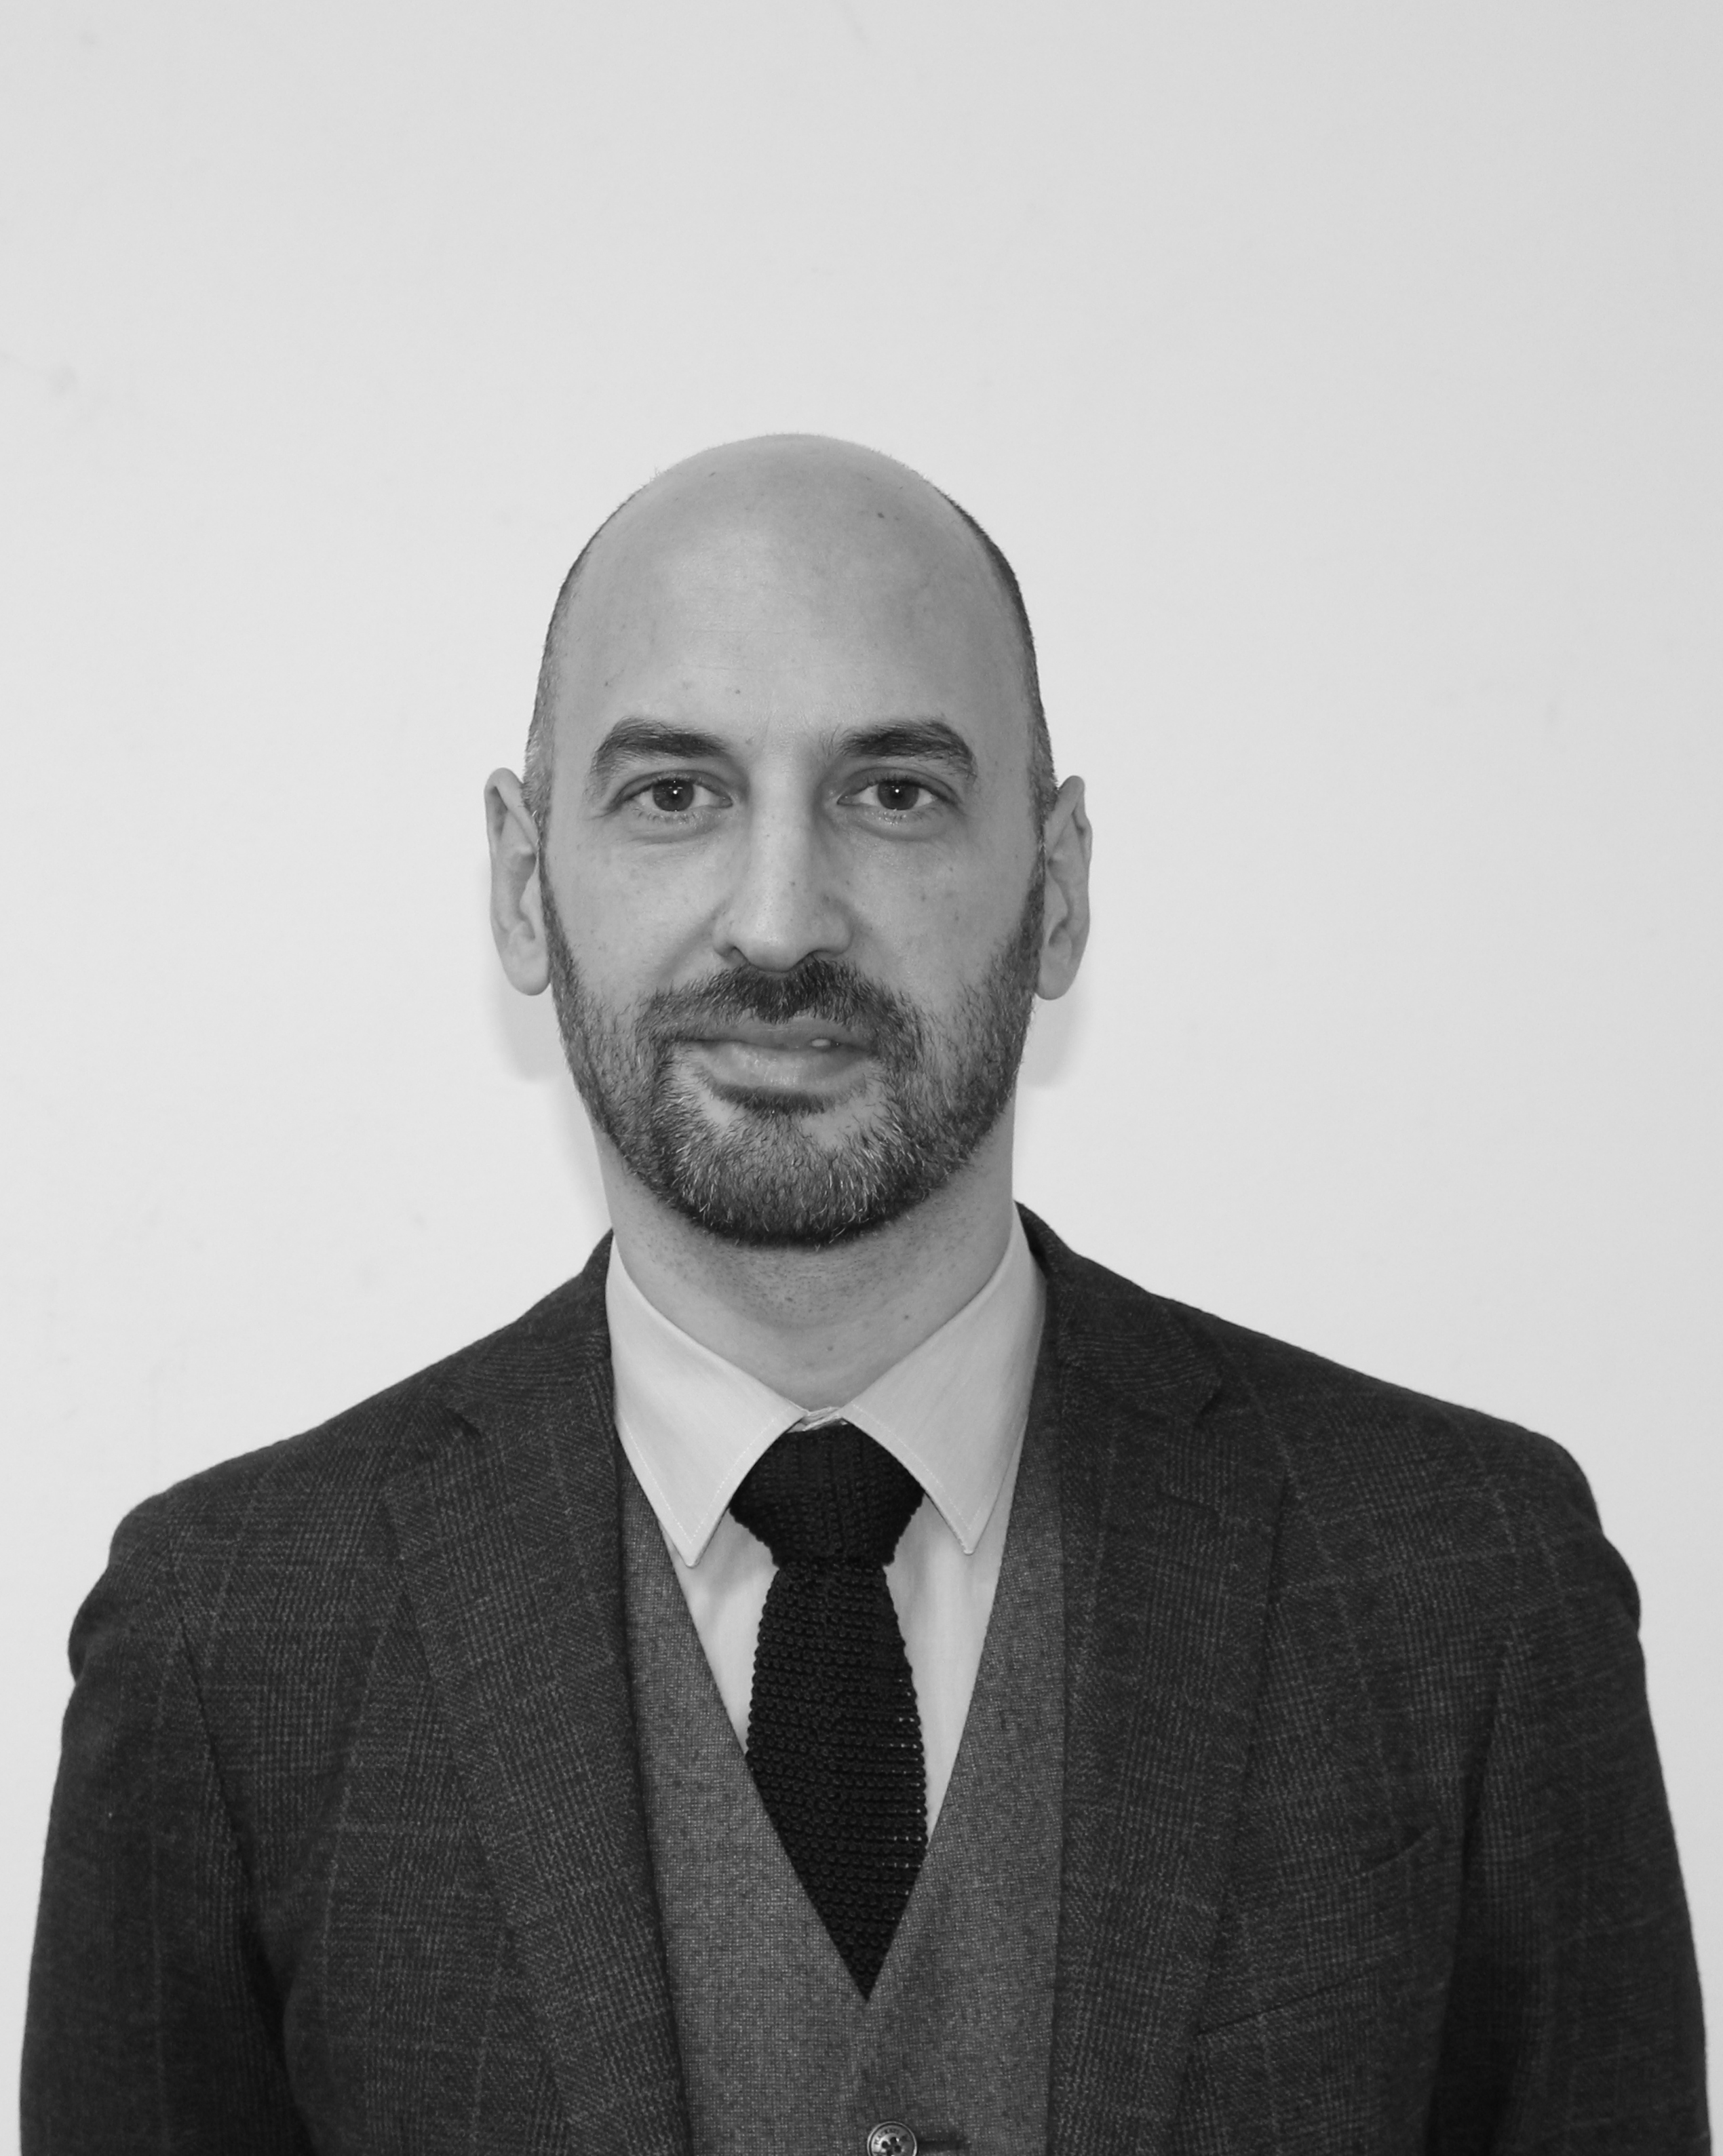 M. TOURNIER-COURTES